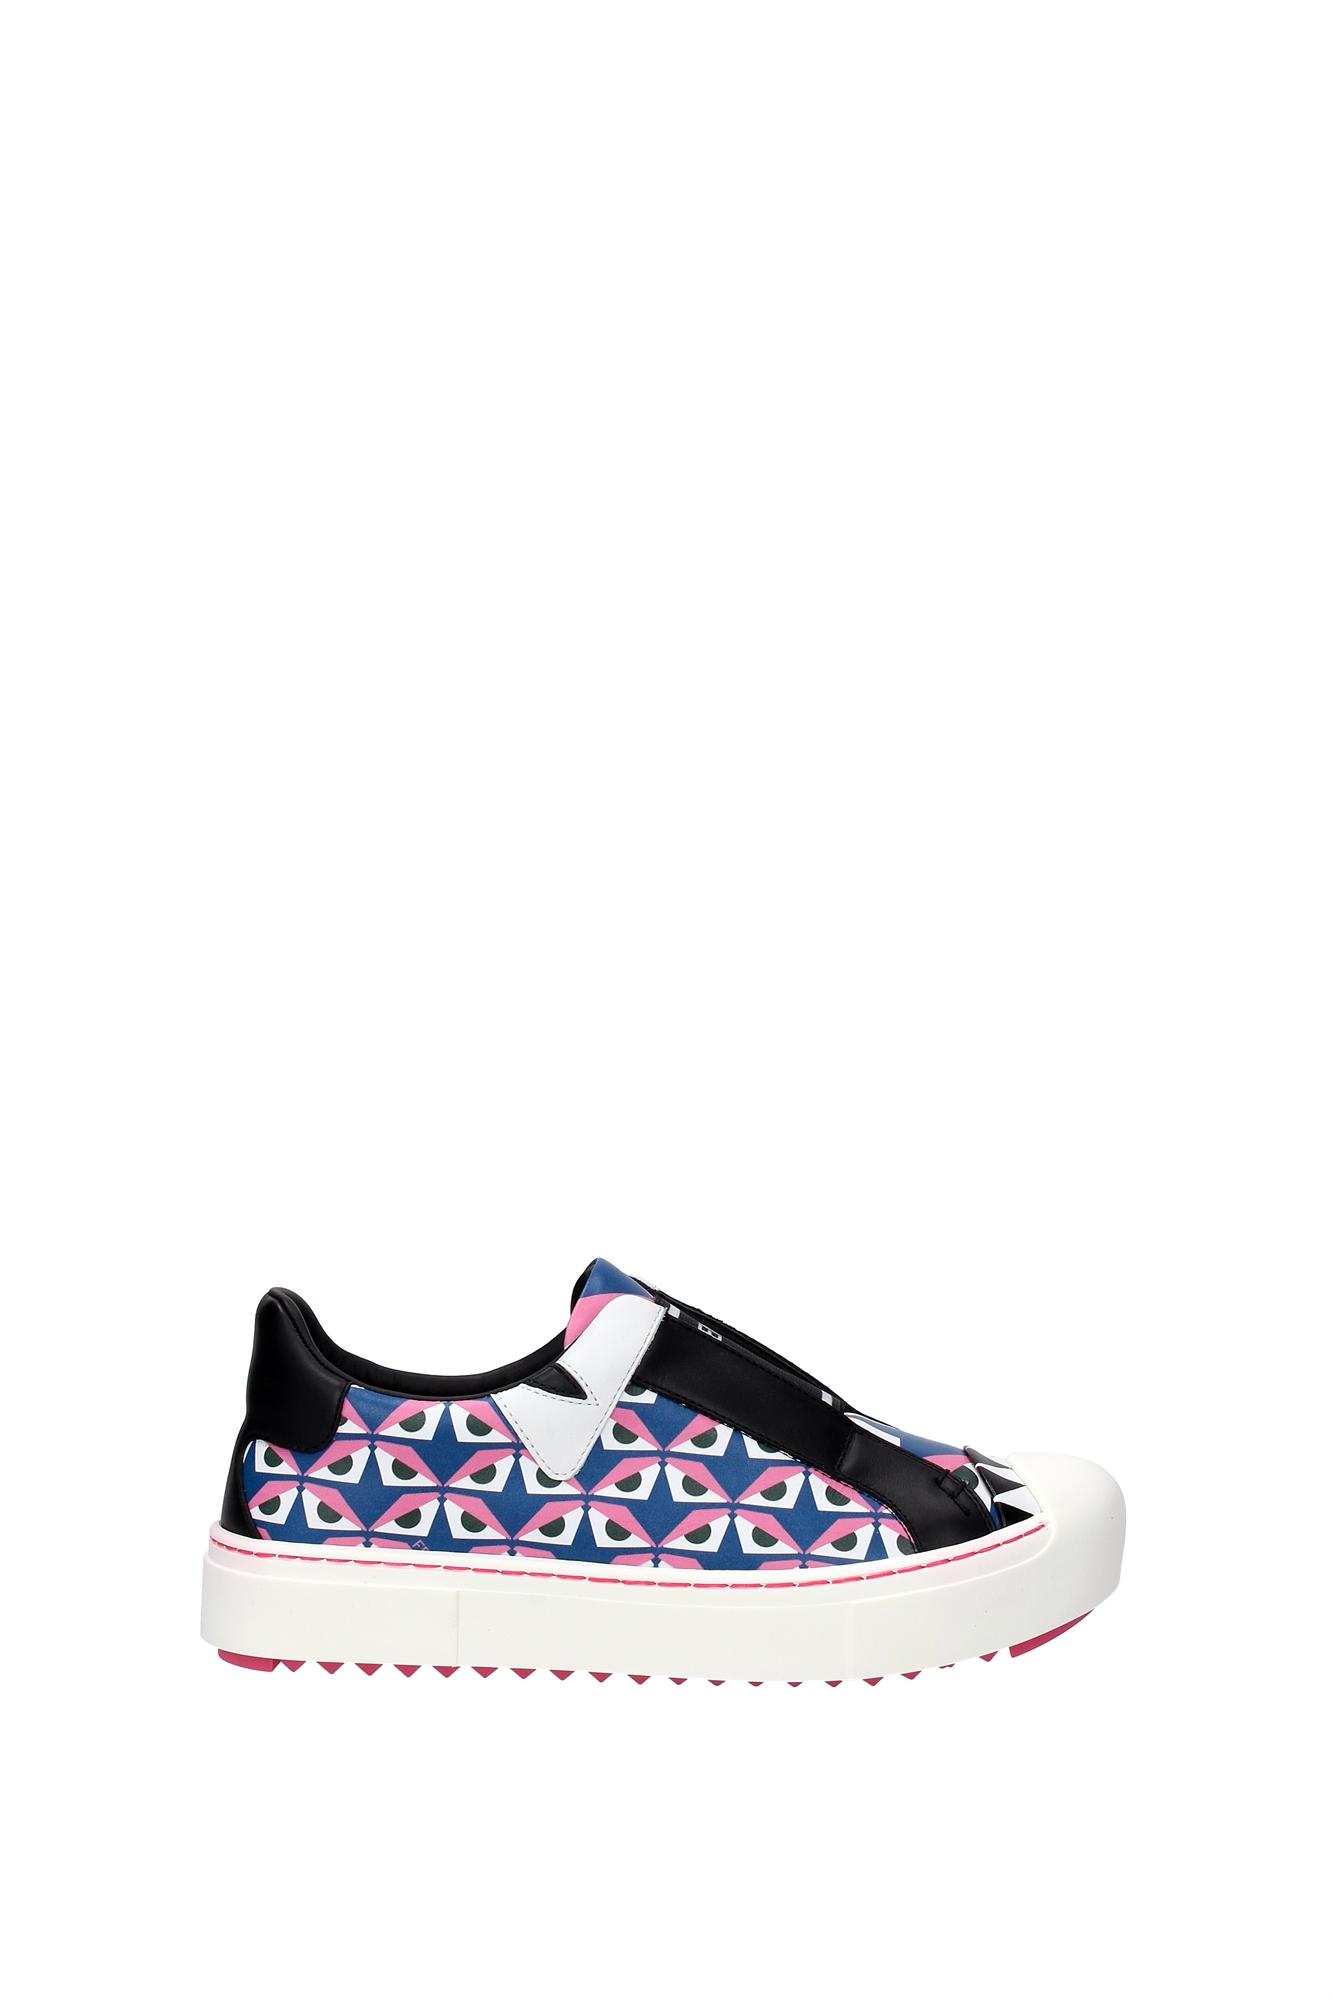 Sneakers Fendi Fendi Fendi Damen -  (8E510891HF073W) 909b71